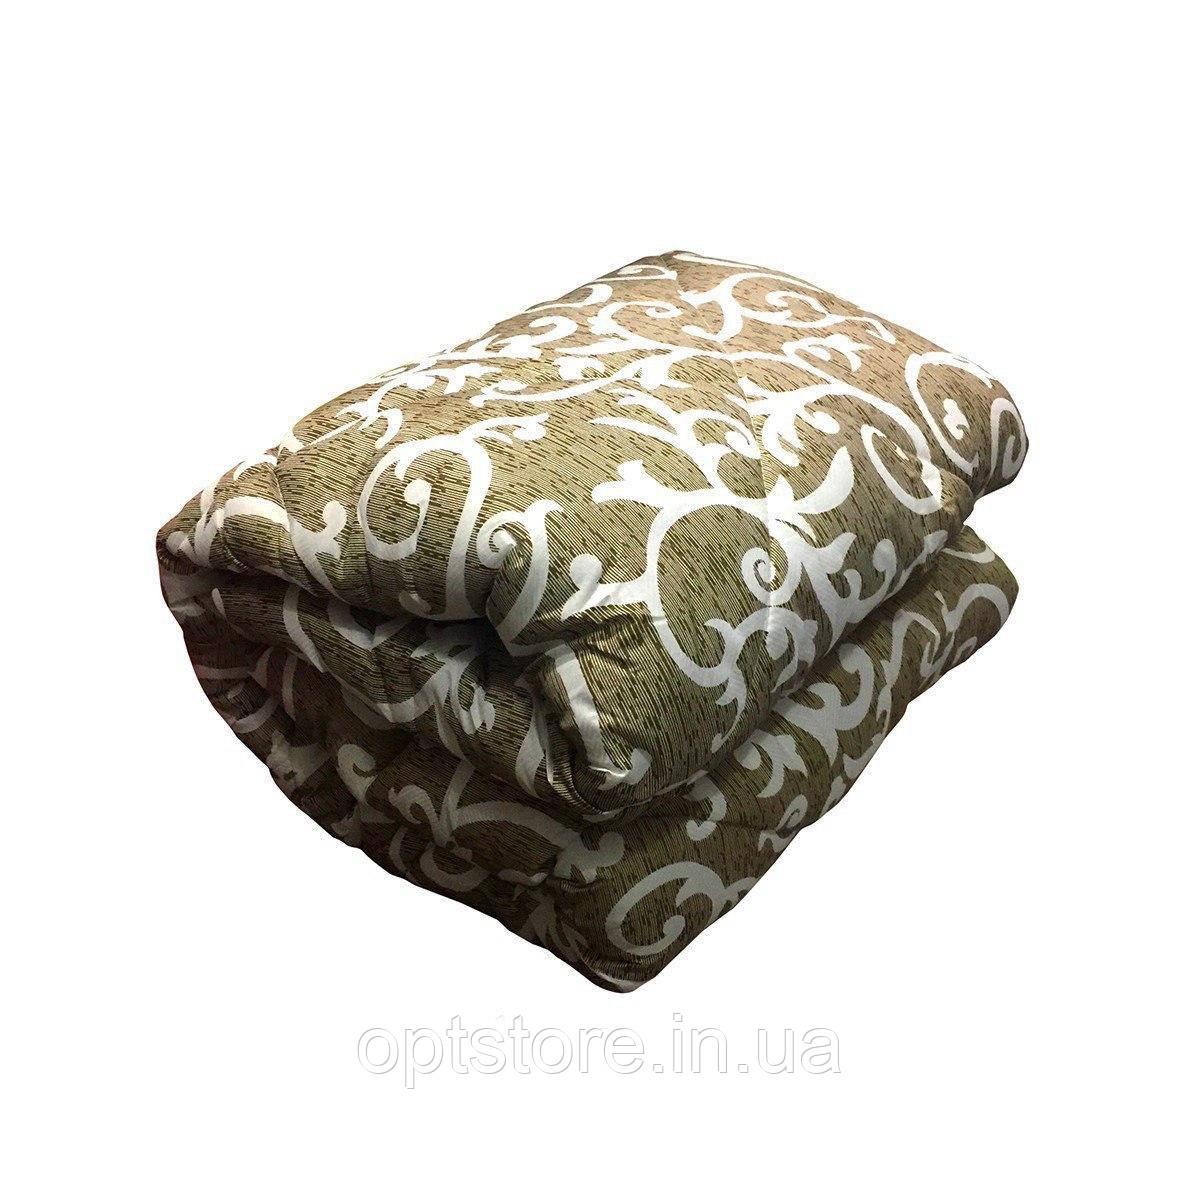 Ковдра полуторна холлофайбер, тканина полікотон